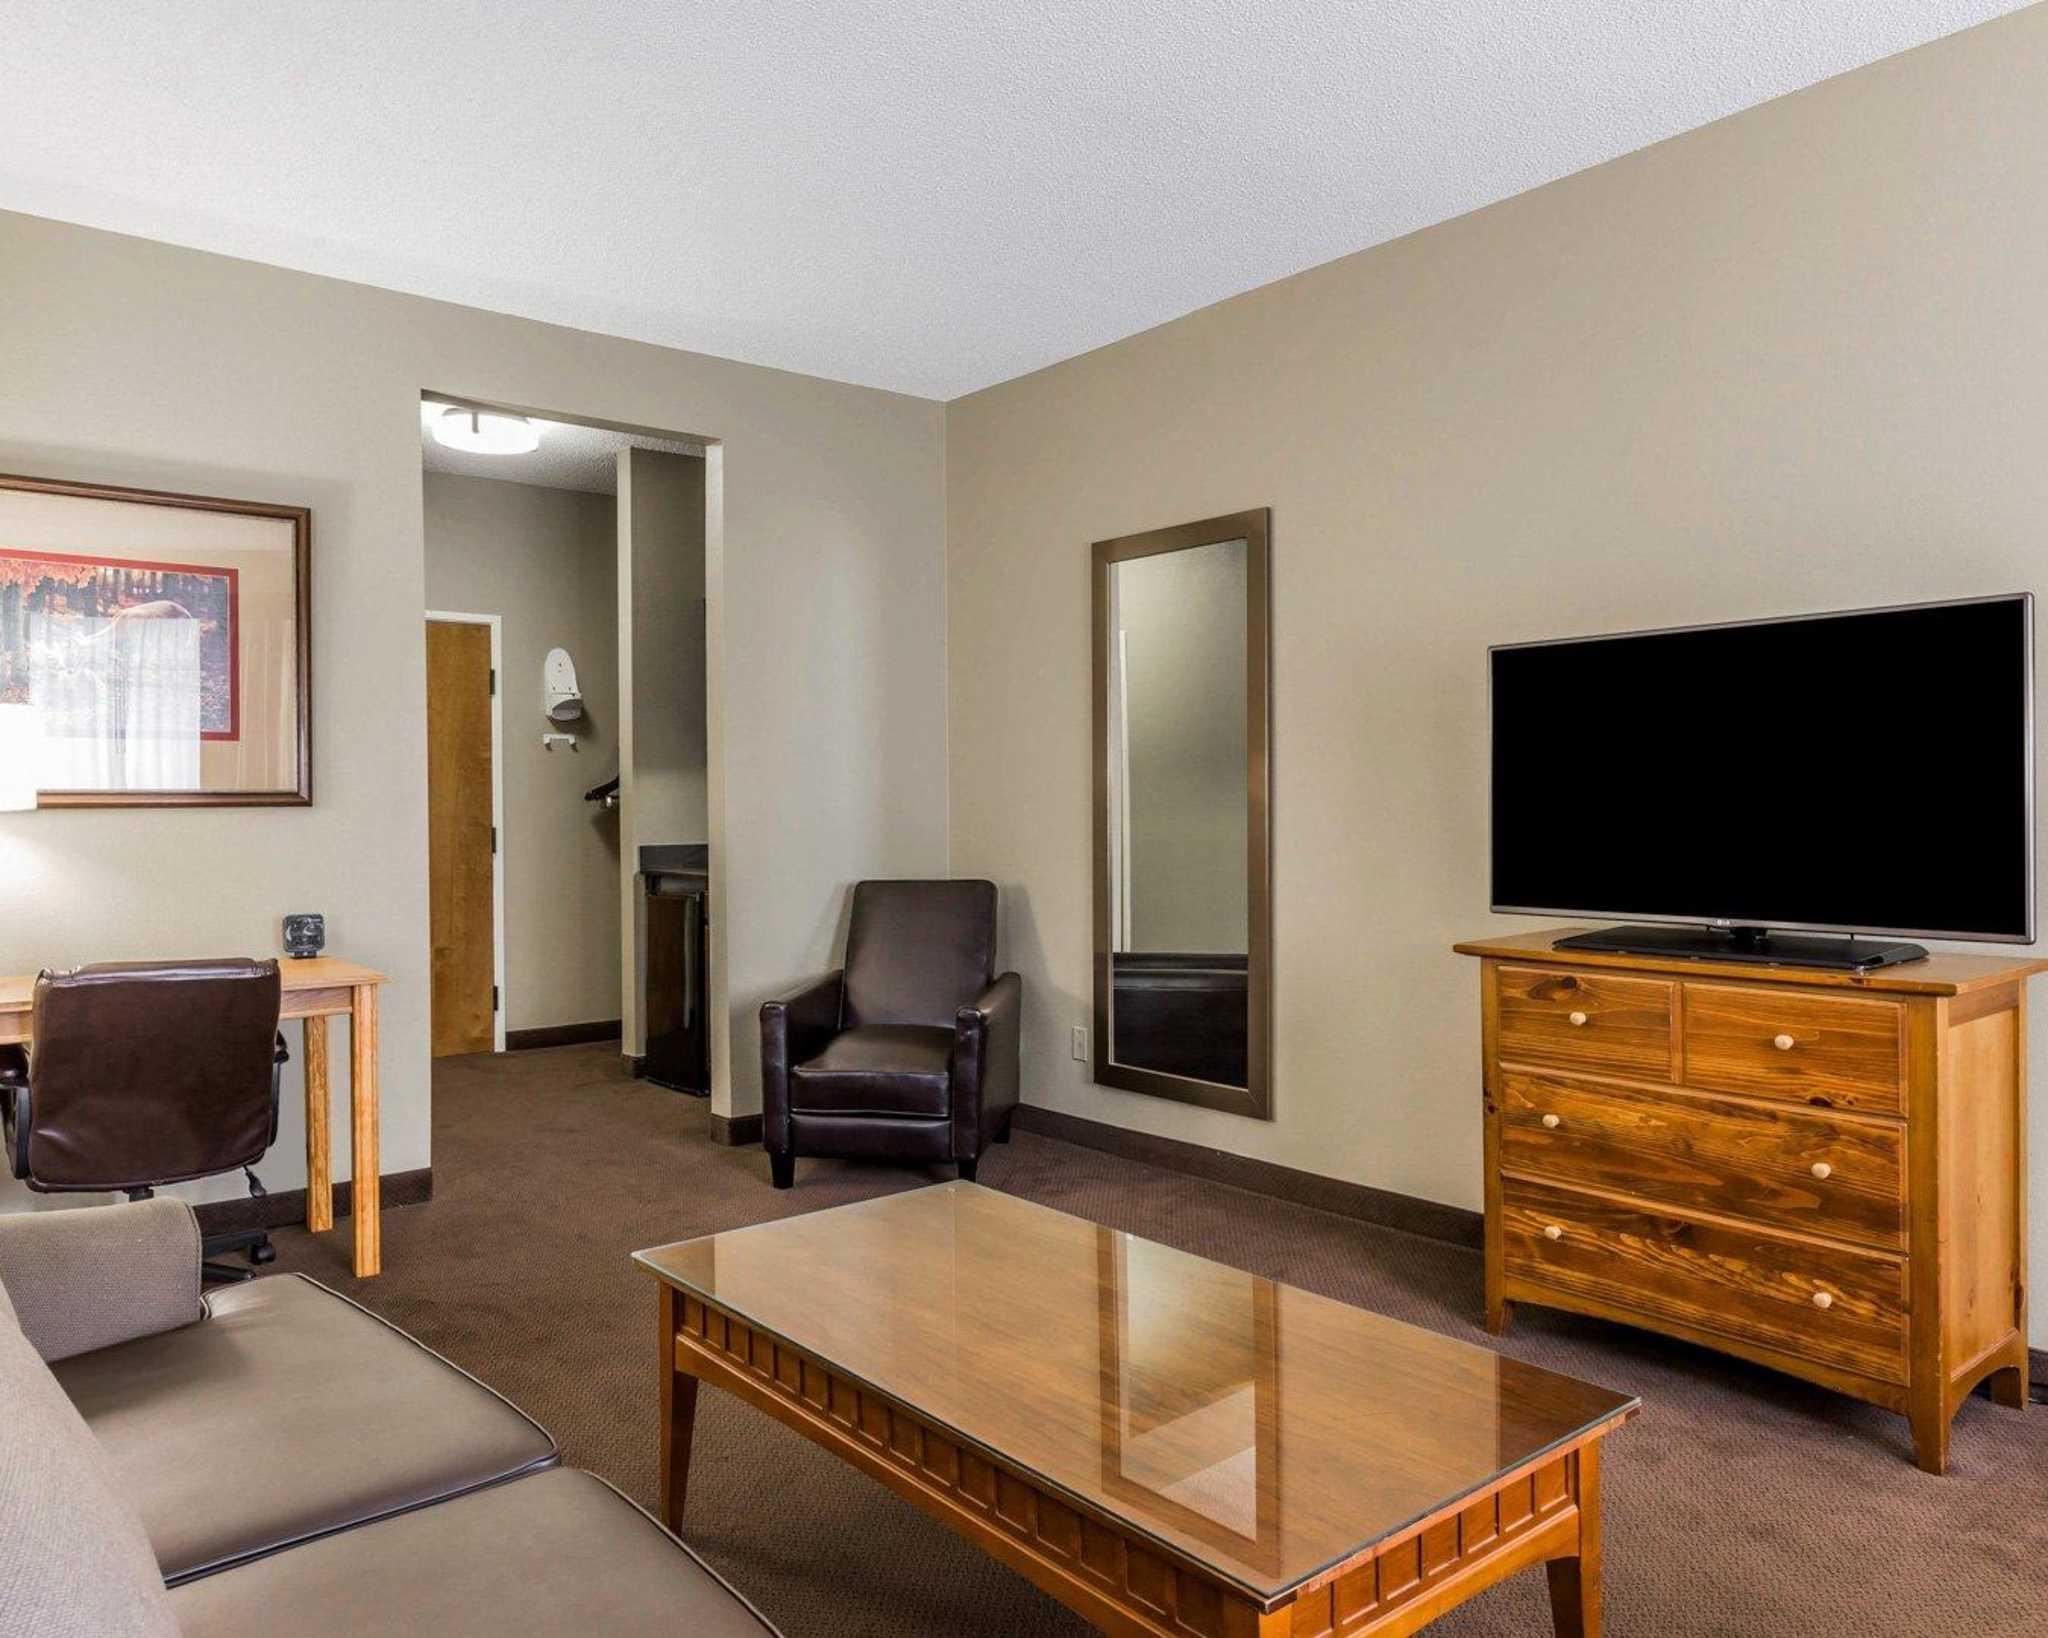 Comfort Suites image 26